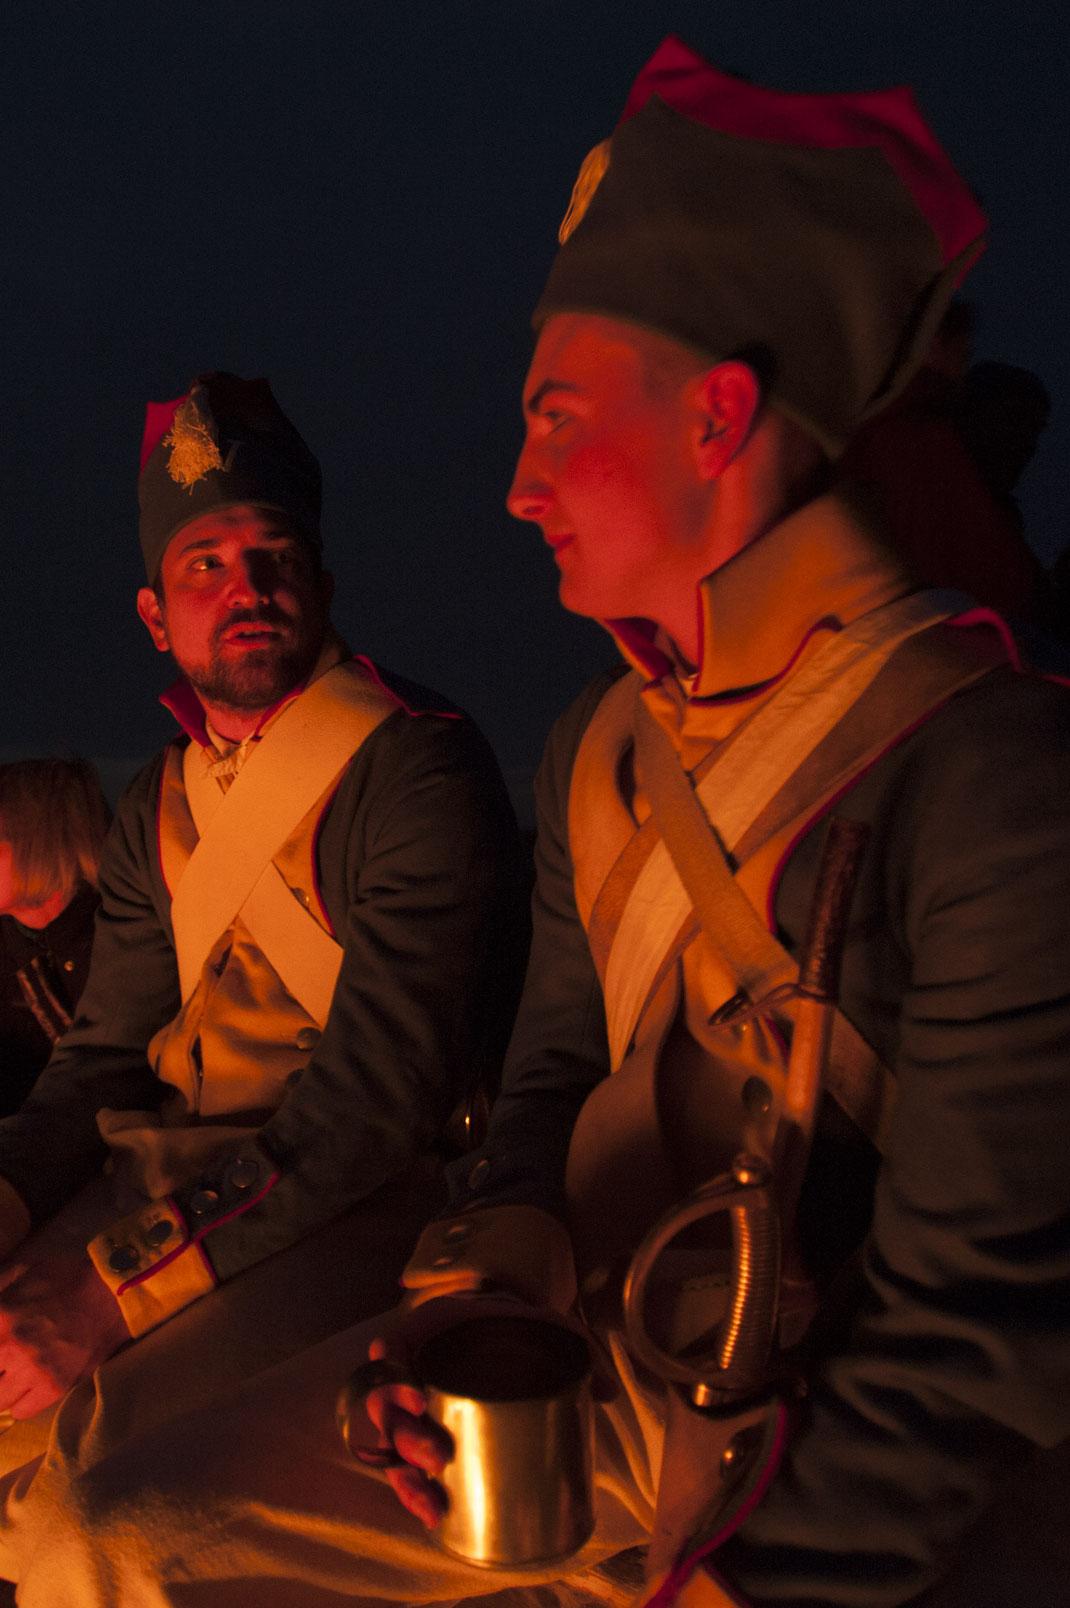 4tes LIR Linieninfanterieregiment Linien Infanterie Regiment Eggmühl 1809 Biwak Uniform Montur 4. LIR 4-LIR 4._LIR königl. baier. 4. Linie